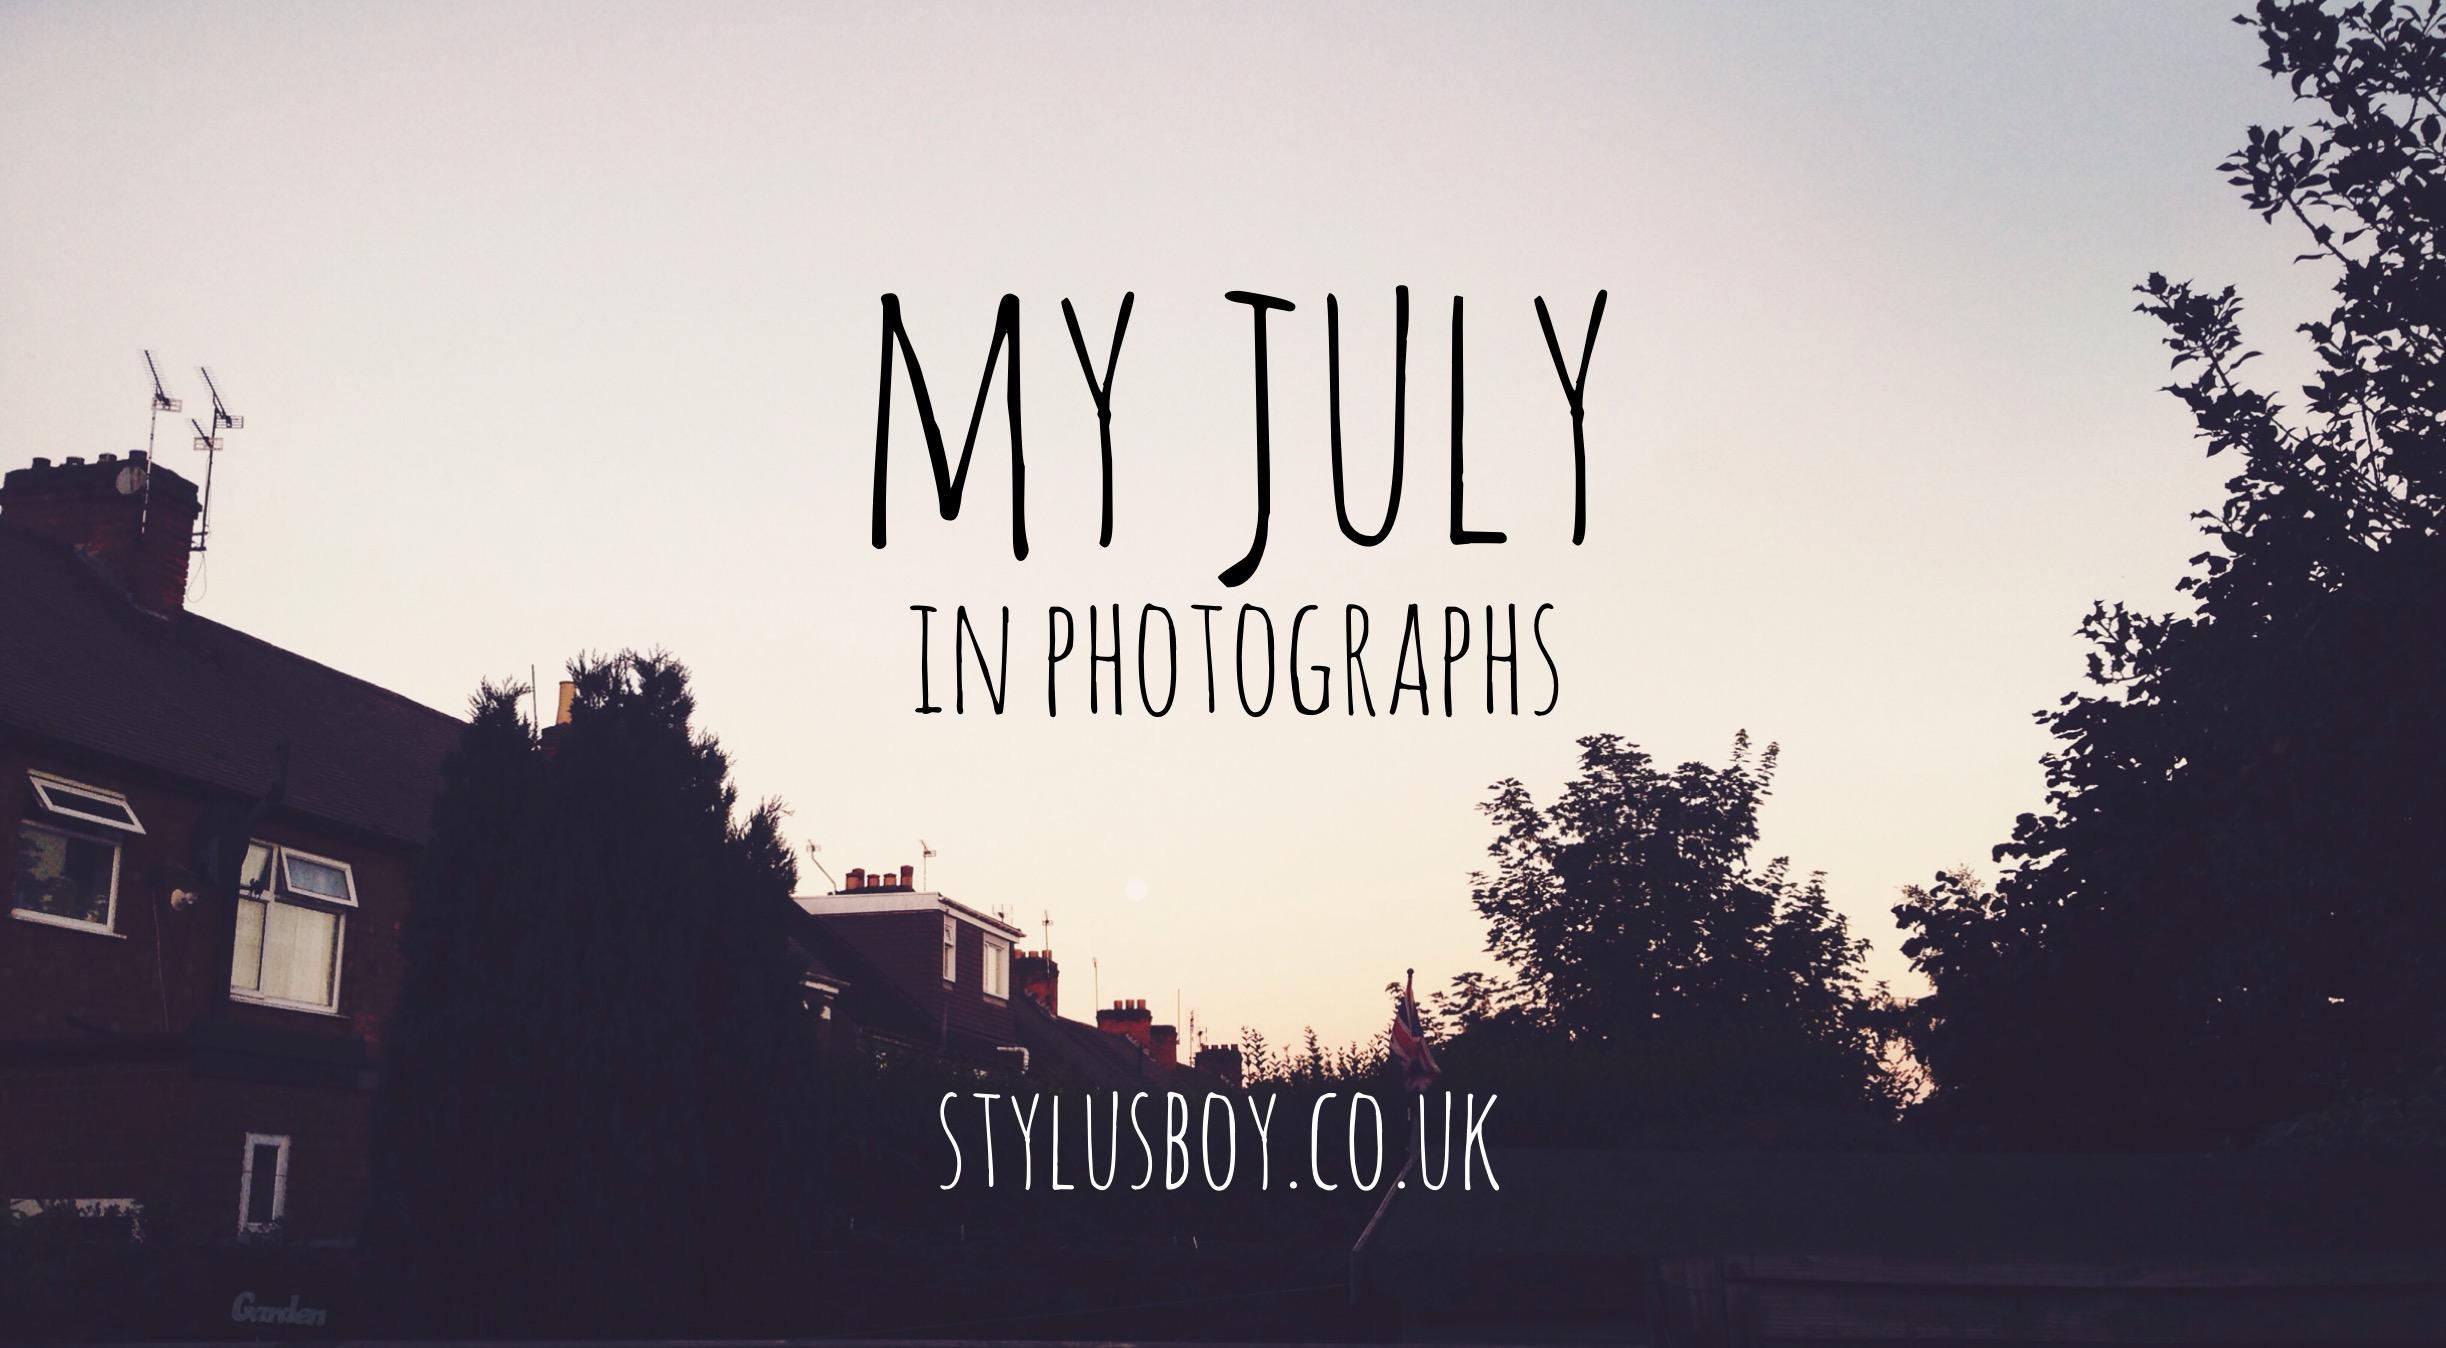 Stylusboy-my-july-in-photopgraphs-blog-header